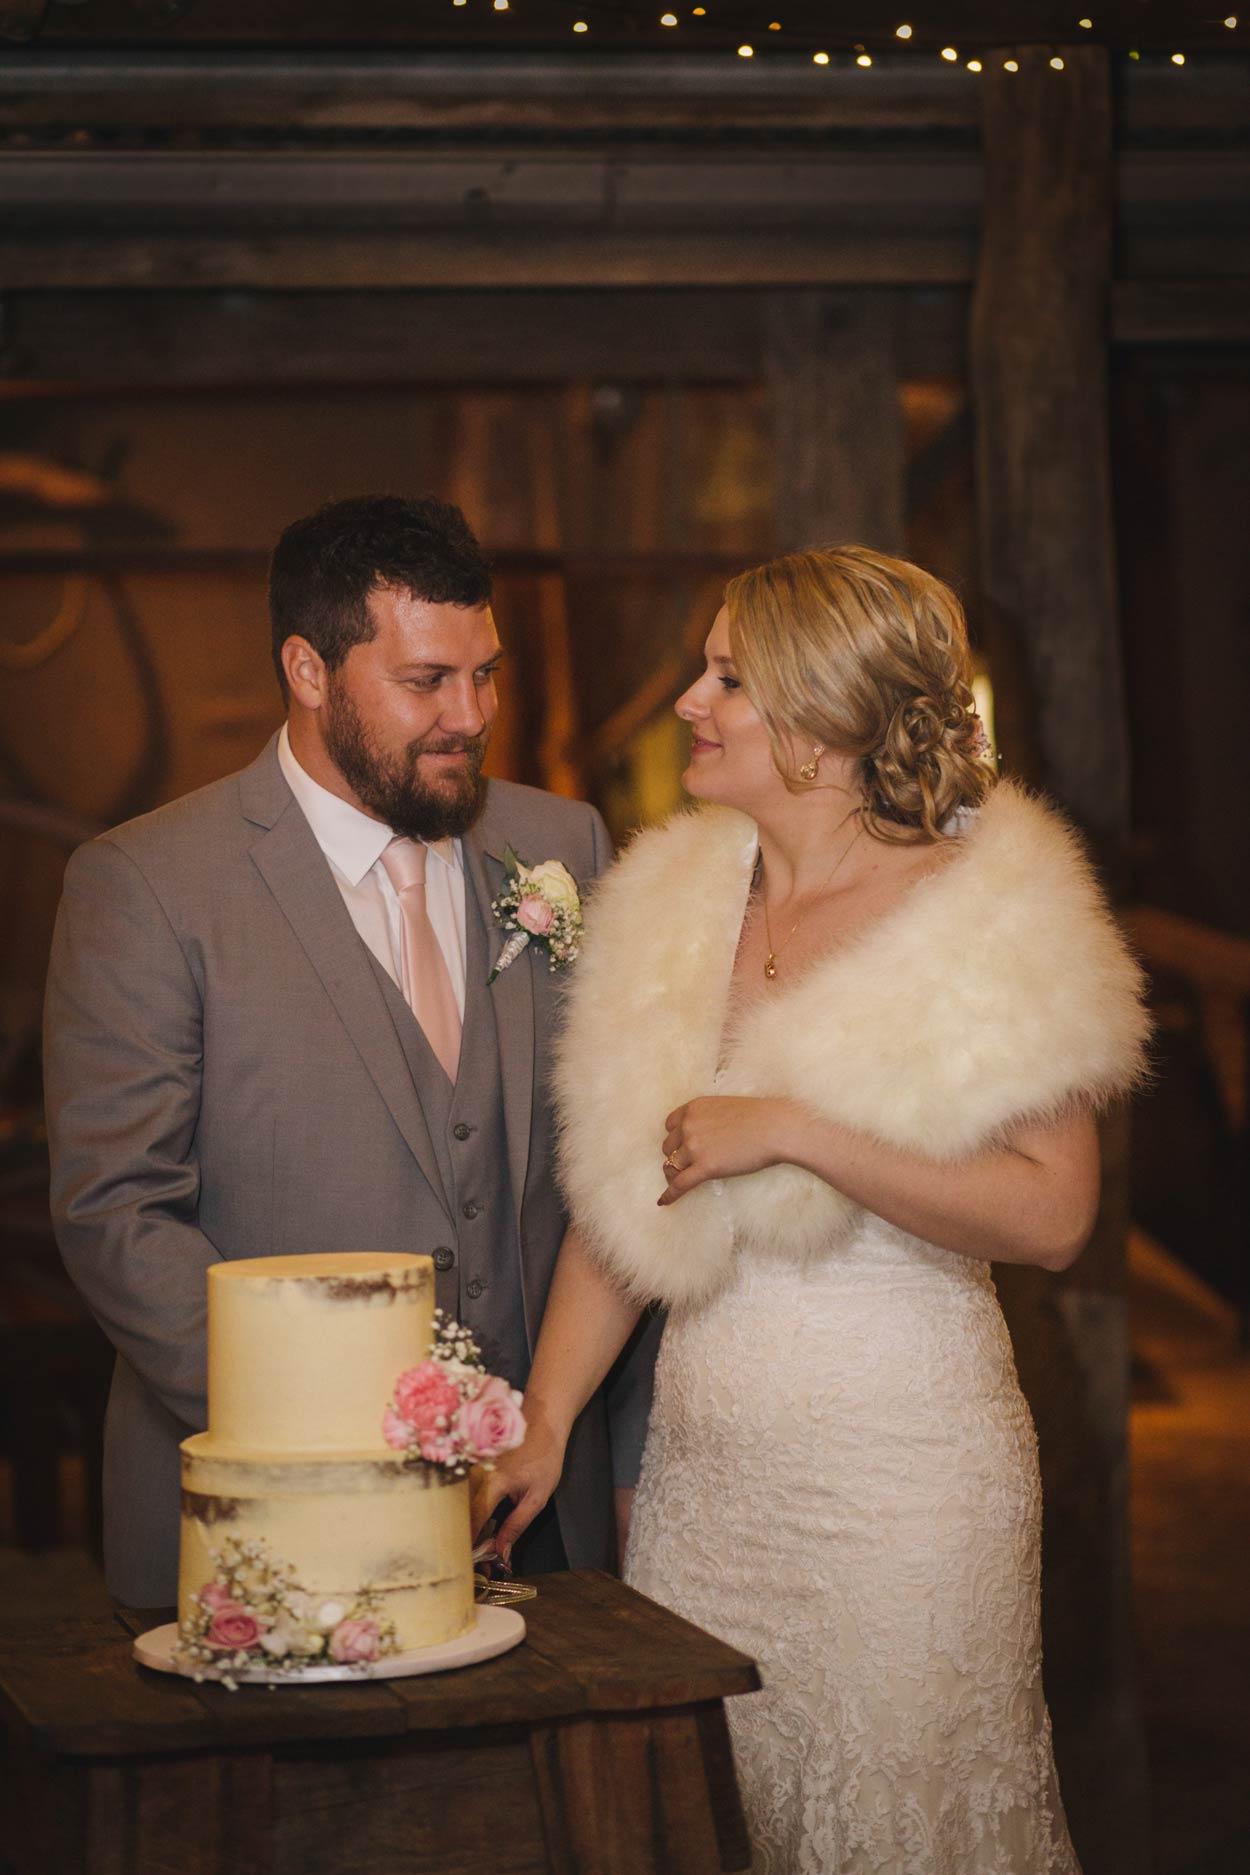 Cake Cutting, Yandina Station, Sunshine Coast - Flaxton, Queensland, Australian Destination Wedding